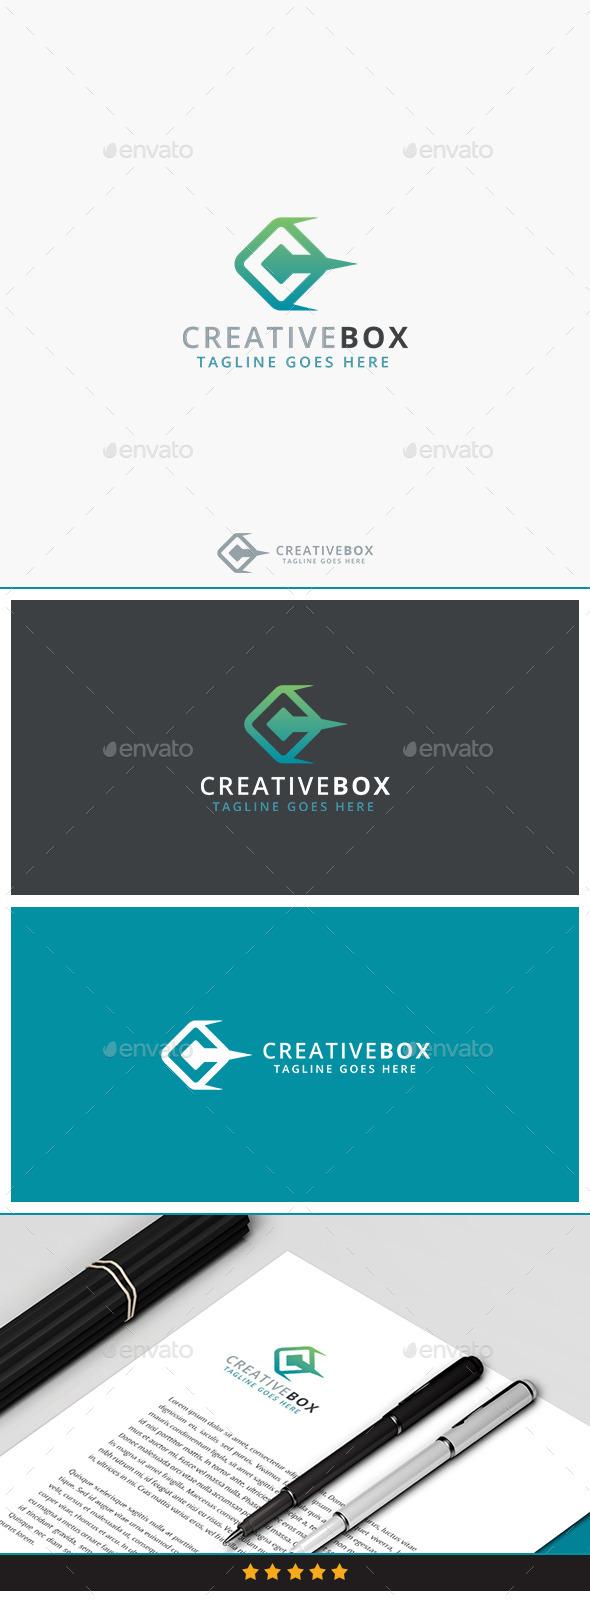 Creative Box Logo - Symbols Logo Templates